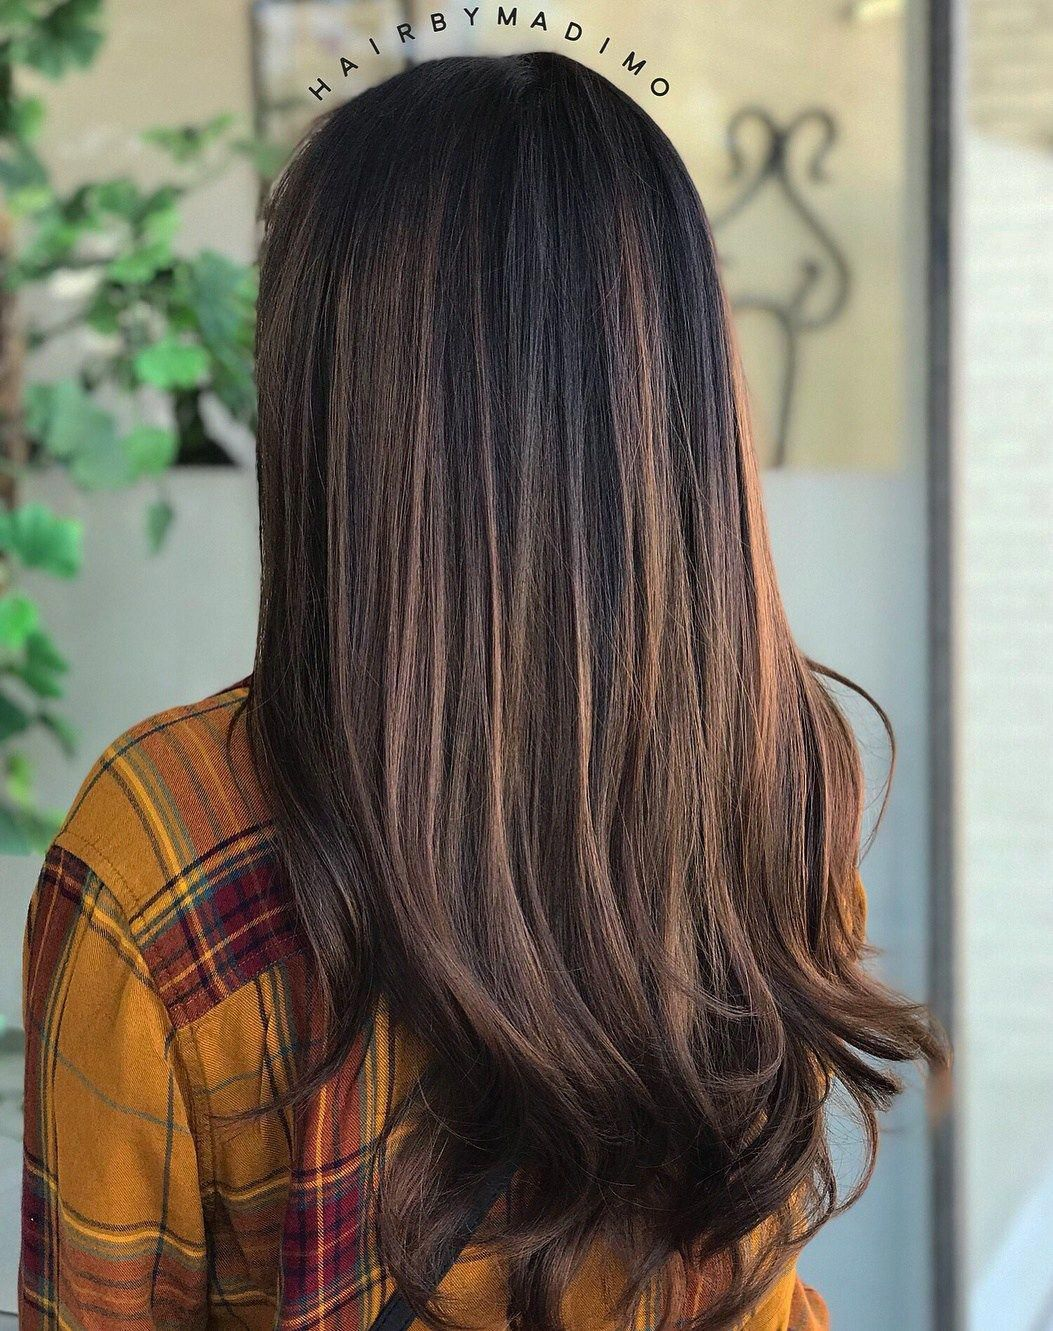 Brushed Chocolate Highlights For Straight Black Hair Darkbrunettehair Hair Color For Black Hair Black Hair Balayage Black Hair With Highlights